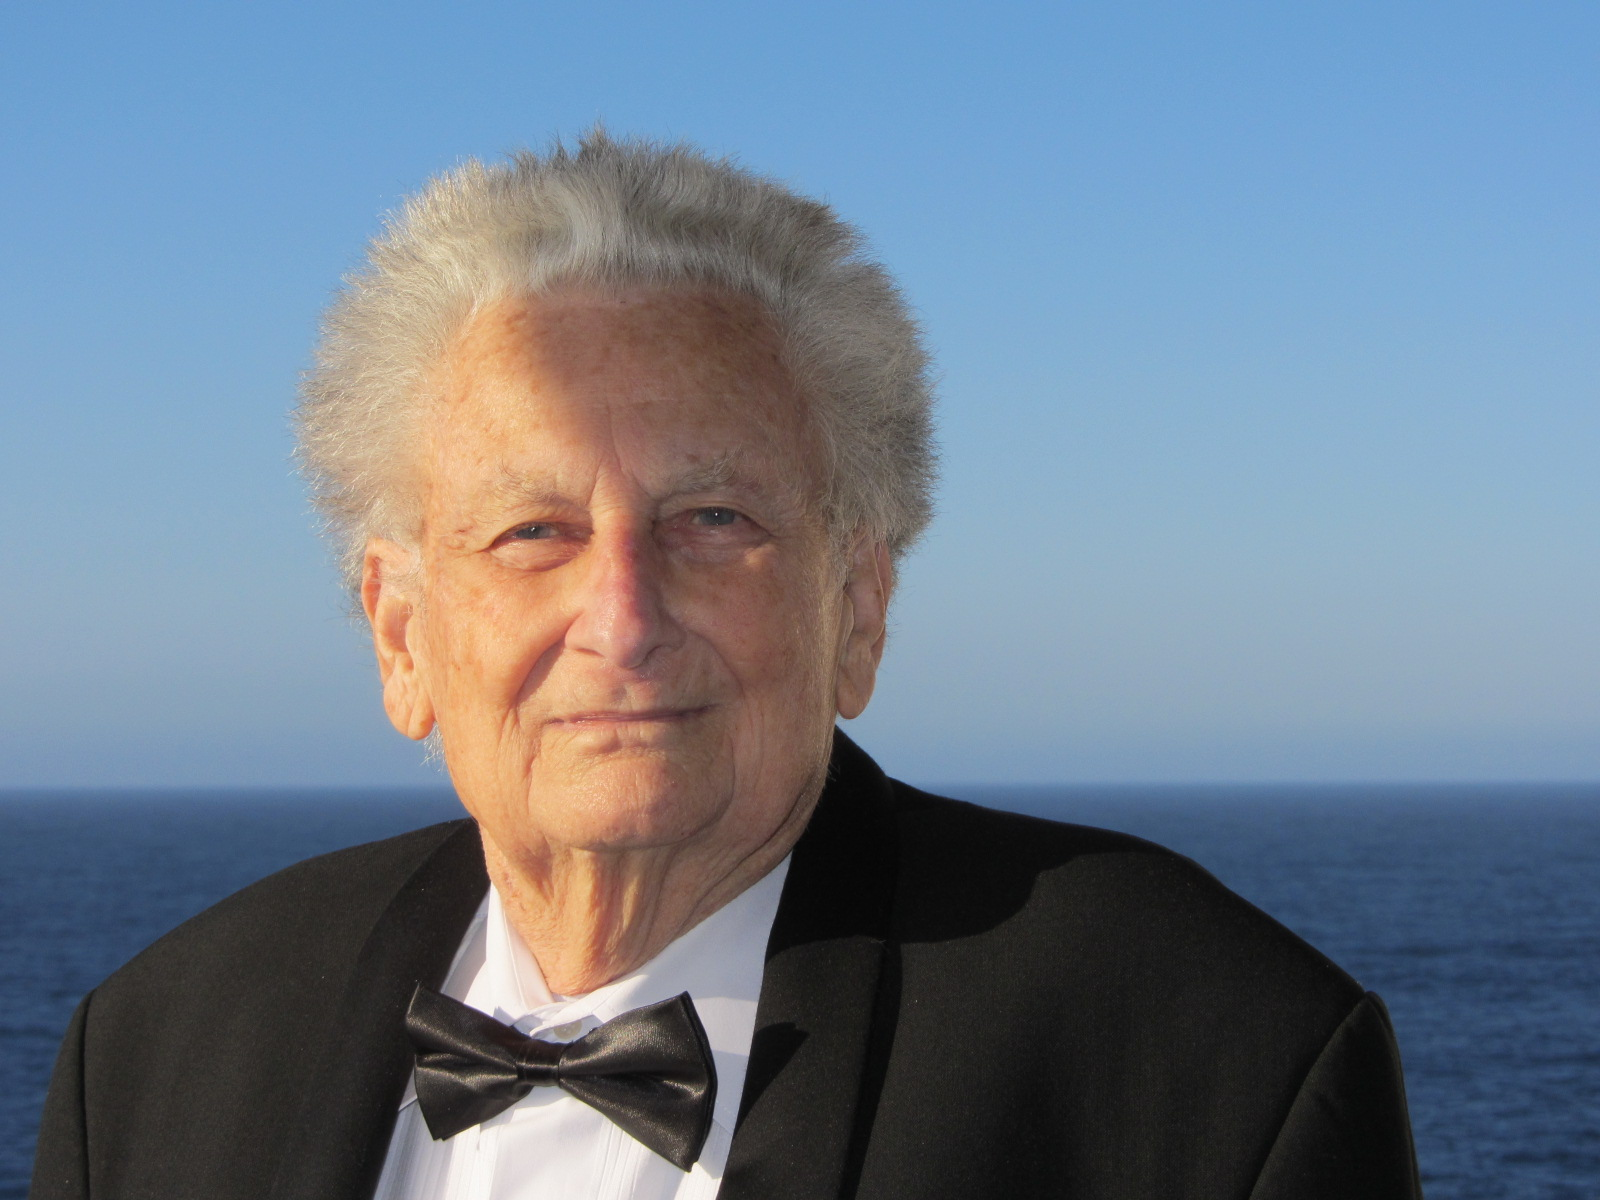 Pierre black tie